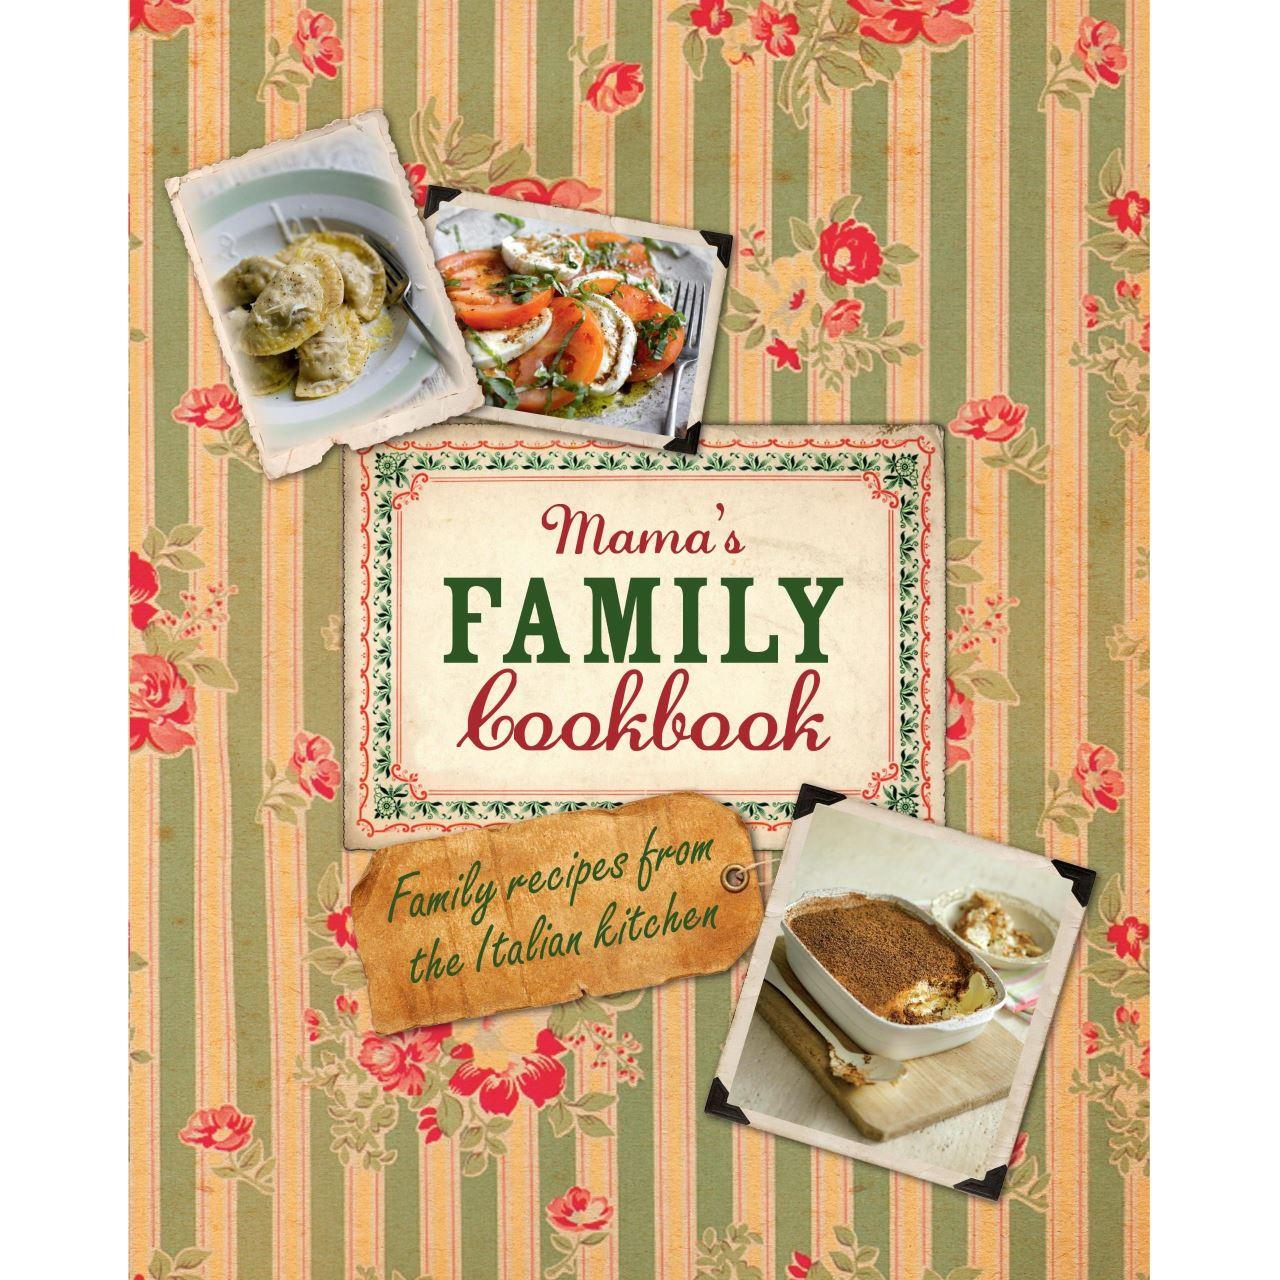 Mama's Italian Family Cookbook (hobbies) imagine